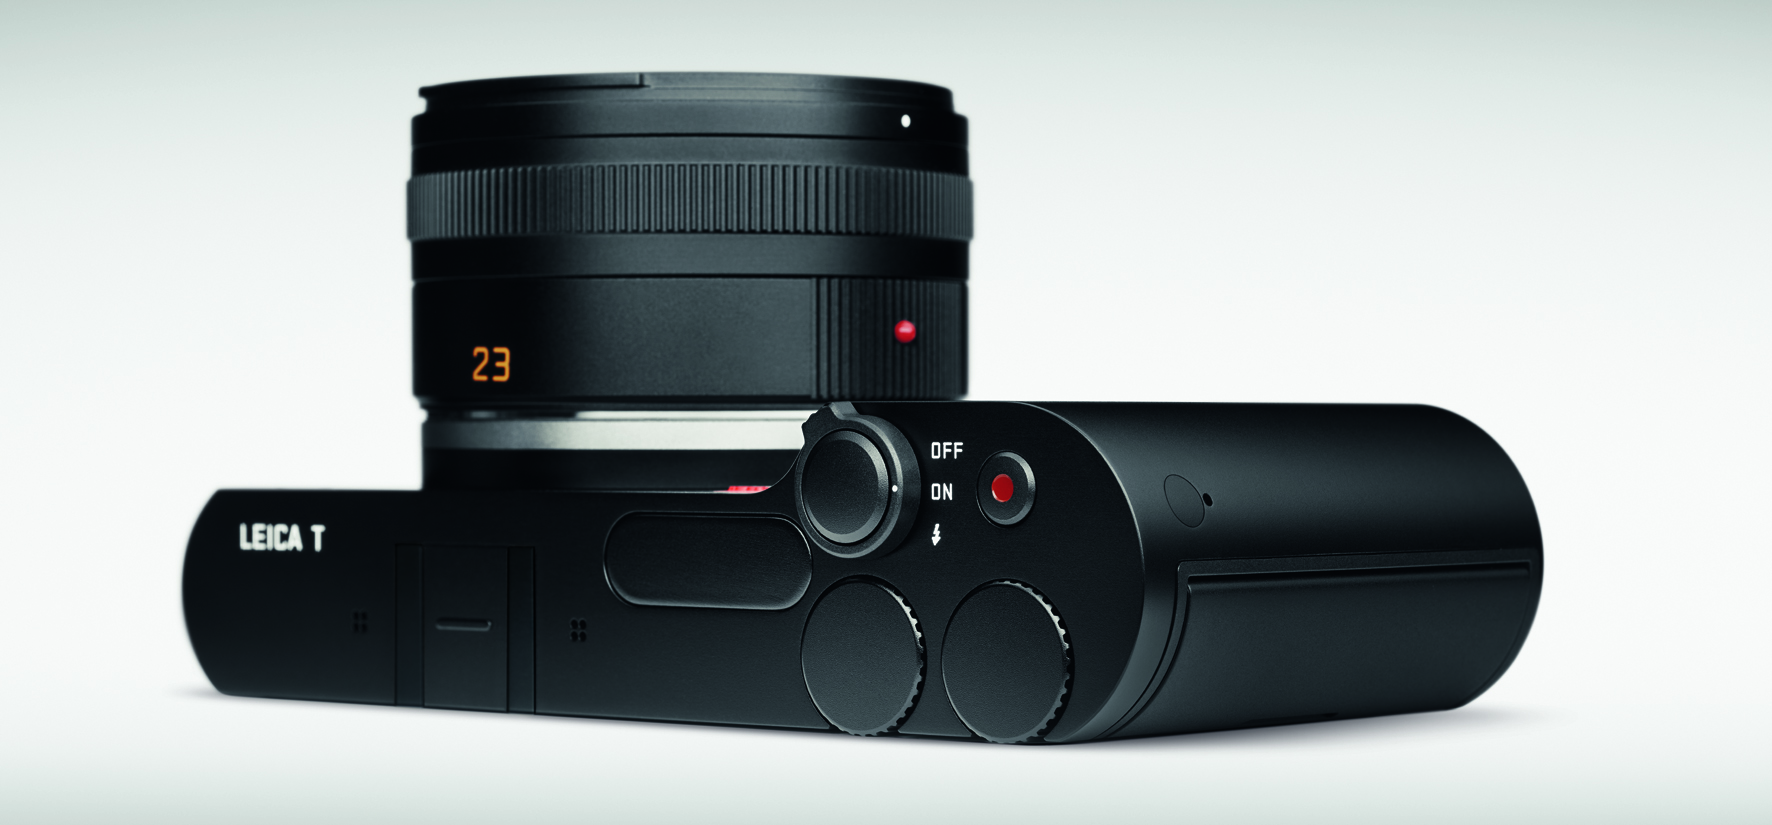 Leica T in black